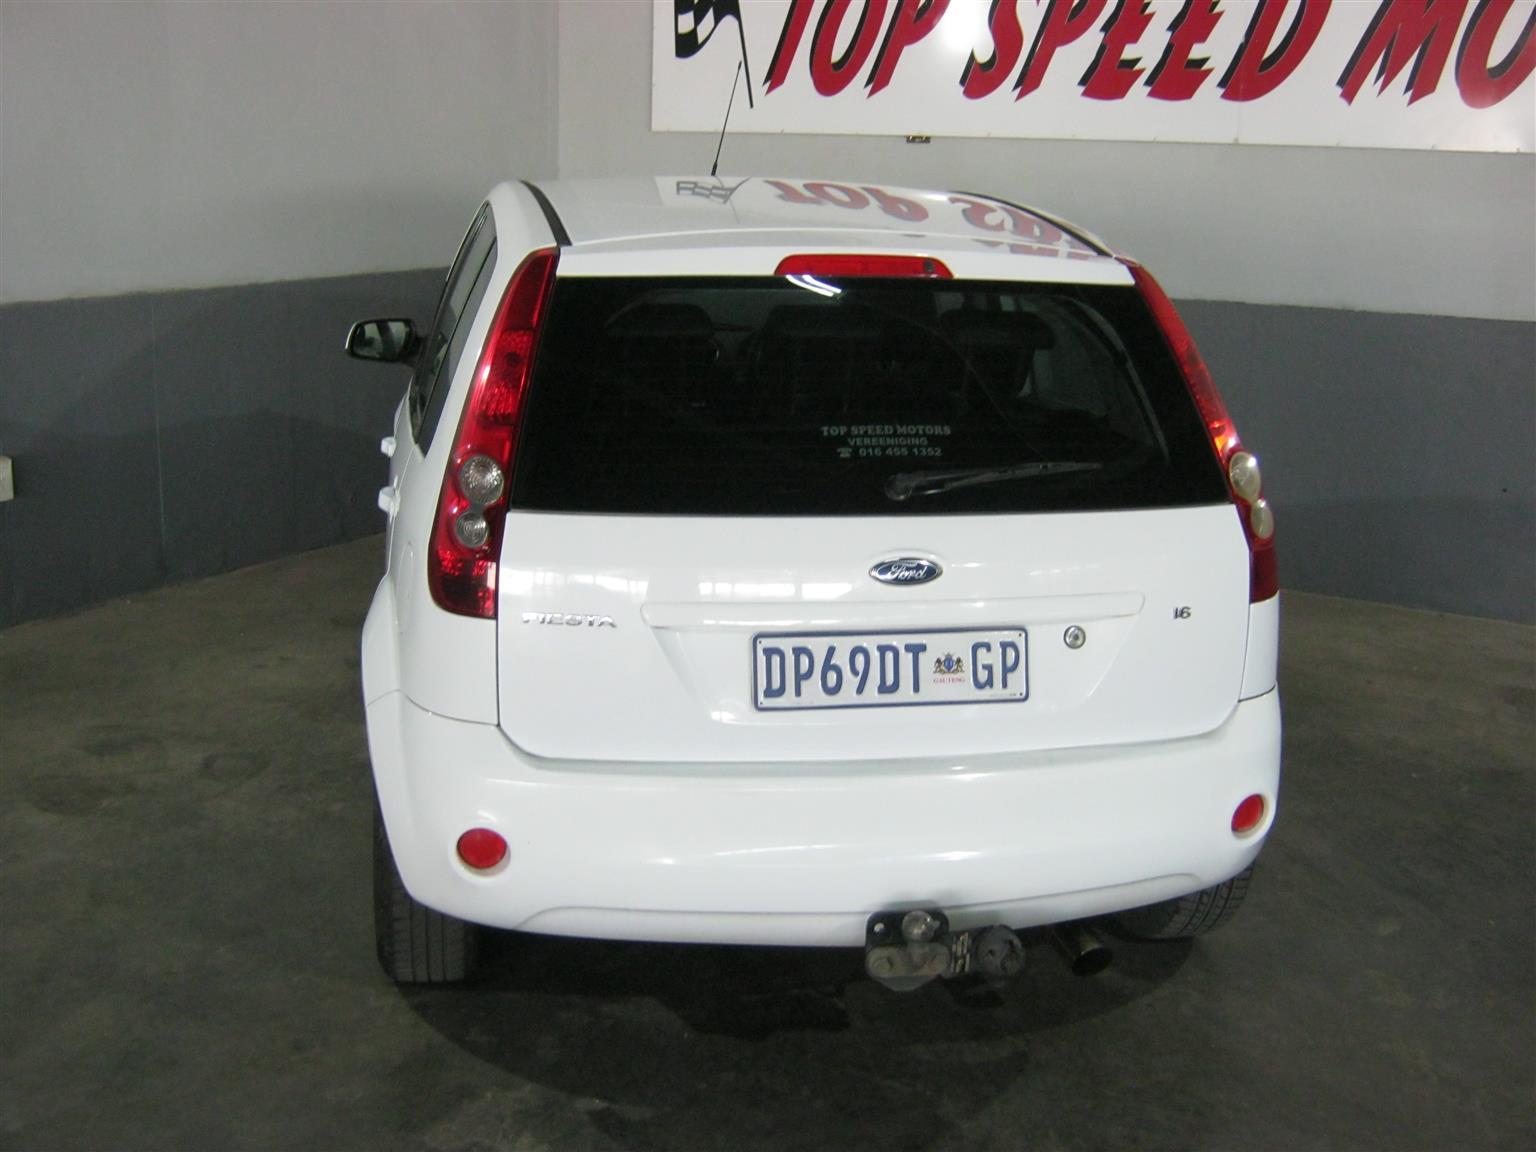 2009 Ford Fiesta 1.6i 5 door Ghia